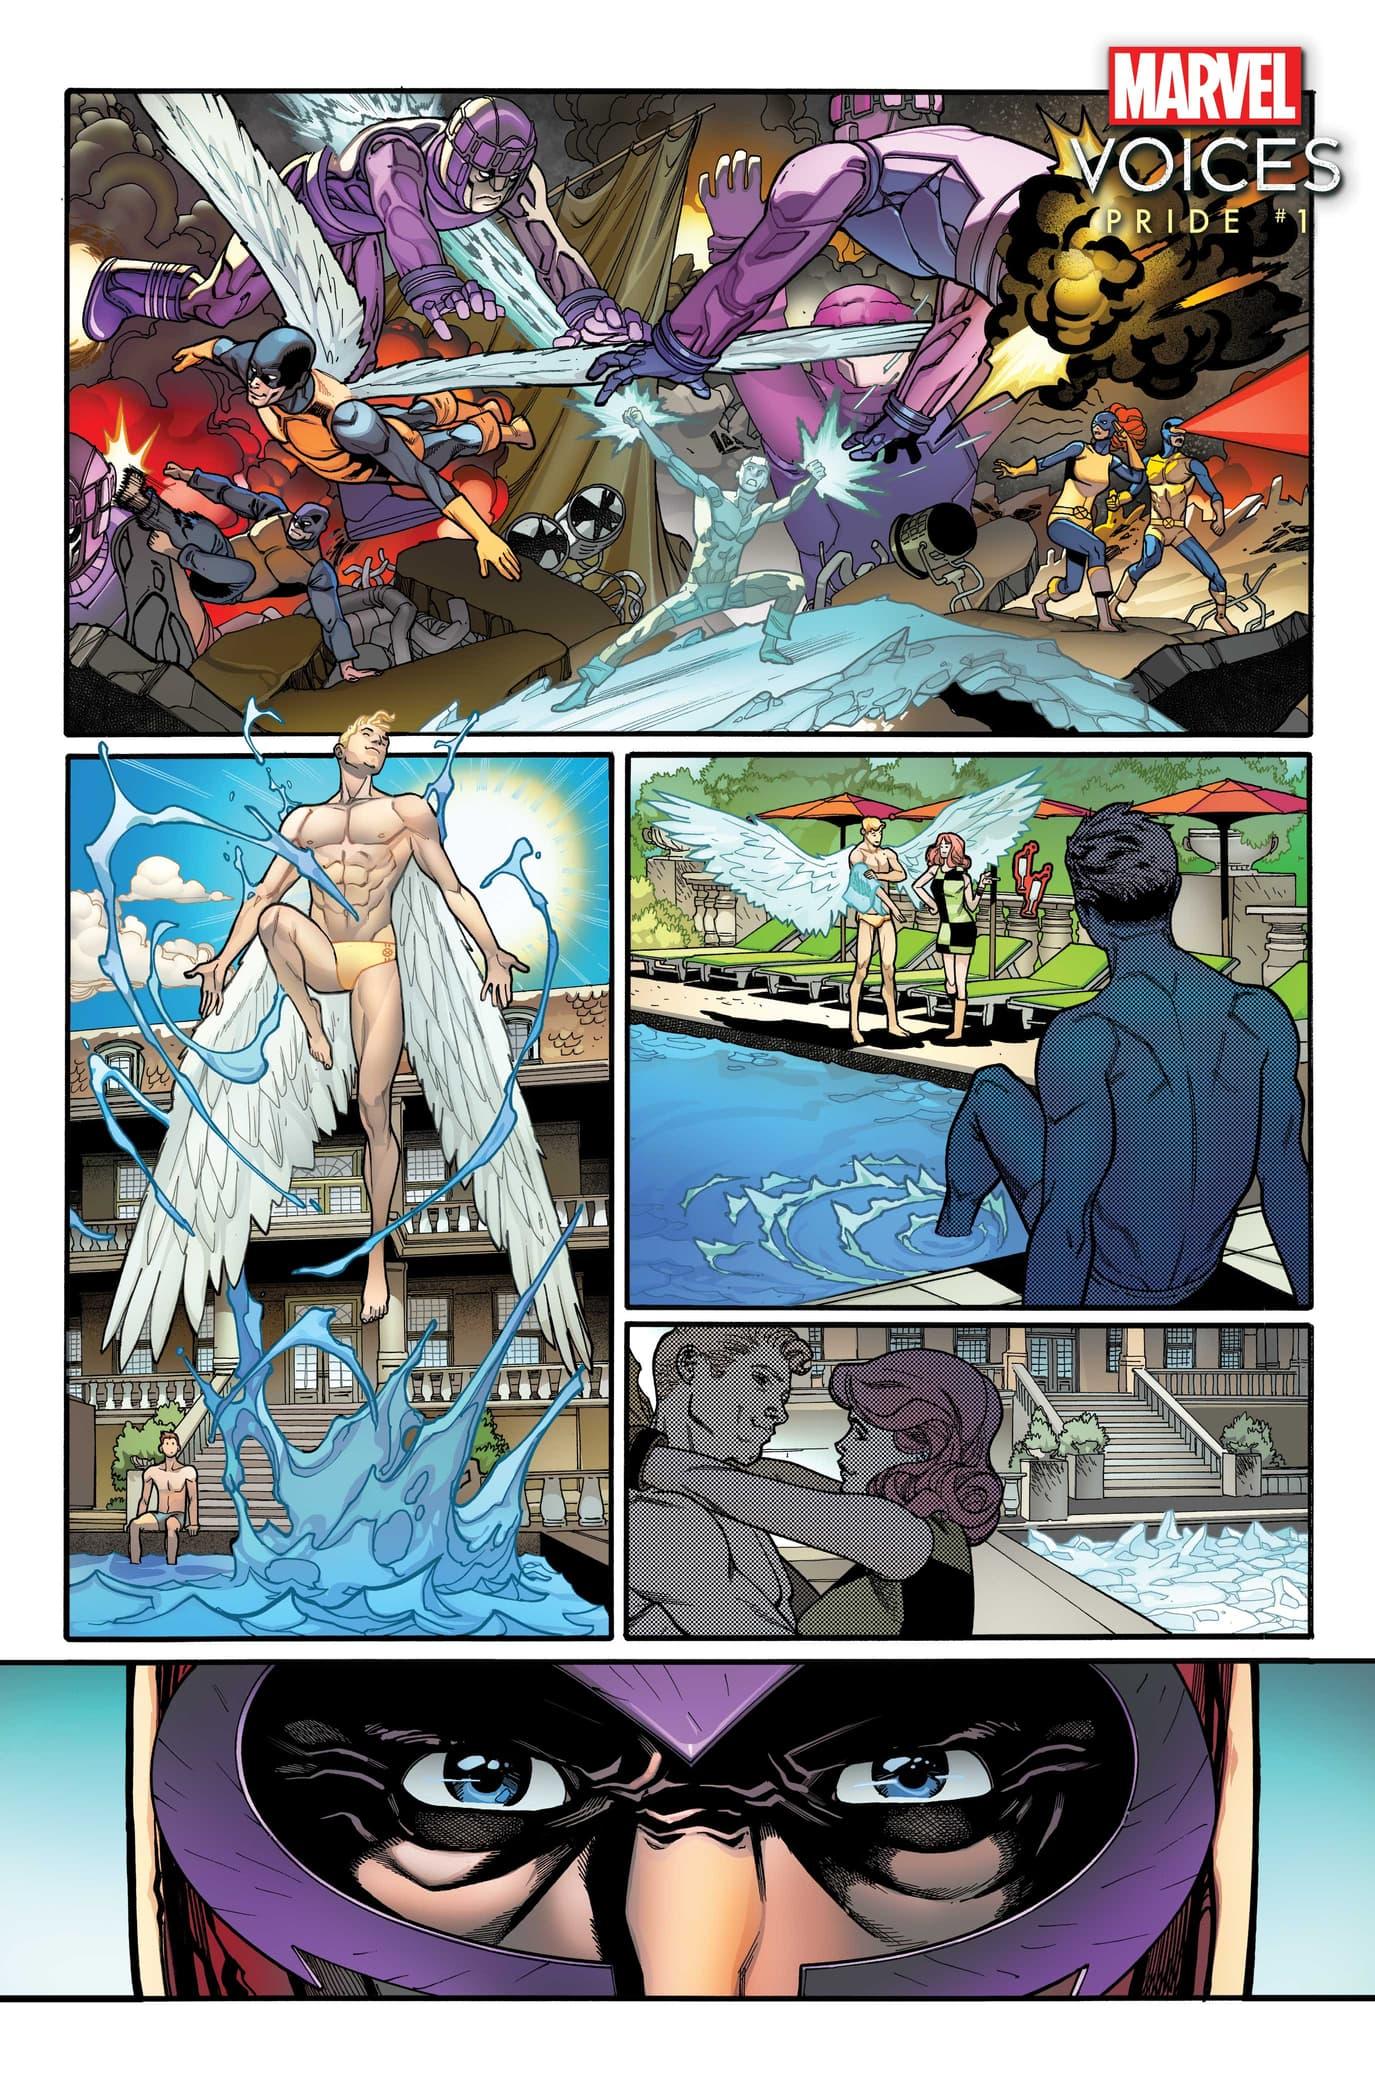 MARVEL'S VOICES: PRIDE #1 preview art by Javier Garrón, colors by David Curiel